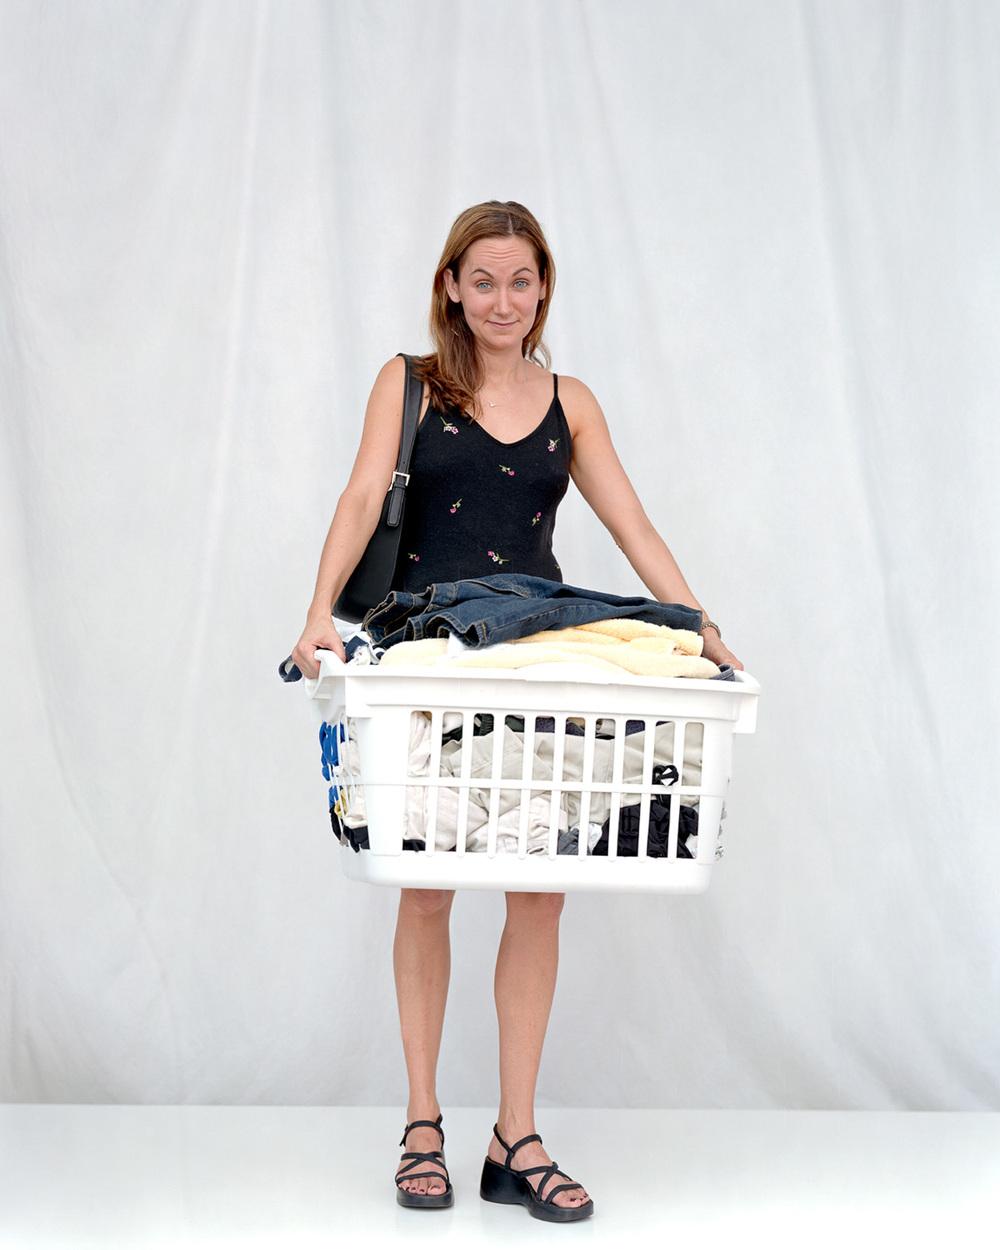 Horan-07-BROlaundry.jpg